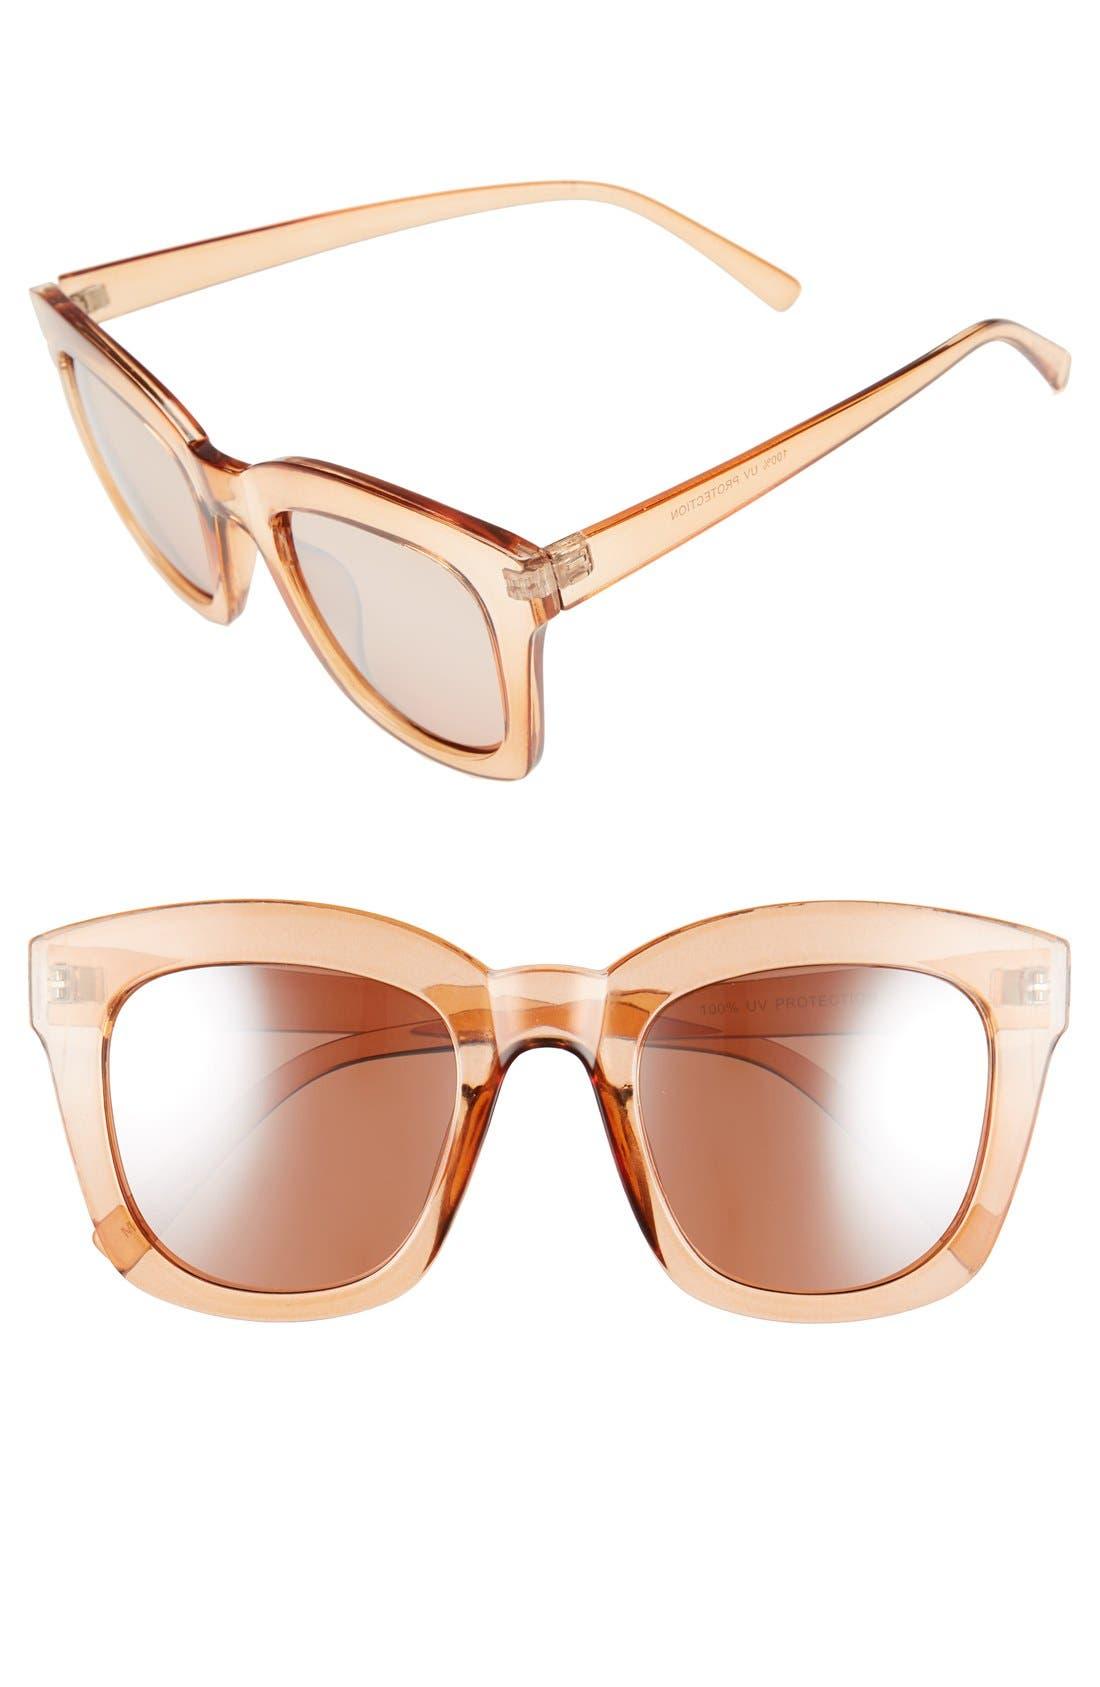 50mm Mirror Square Sunglasses,                             Main thumbnail 1, color,                             715